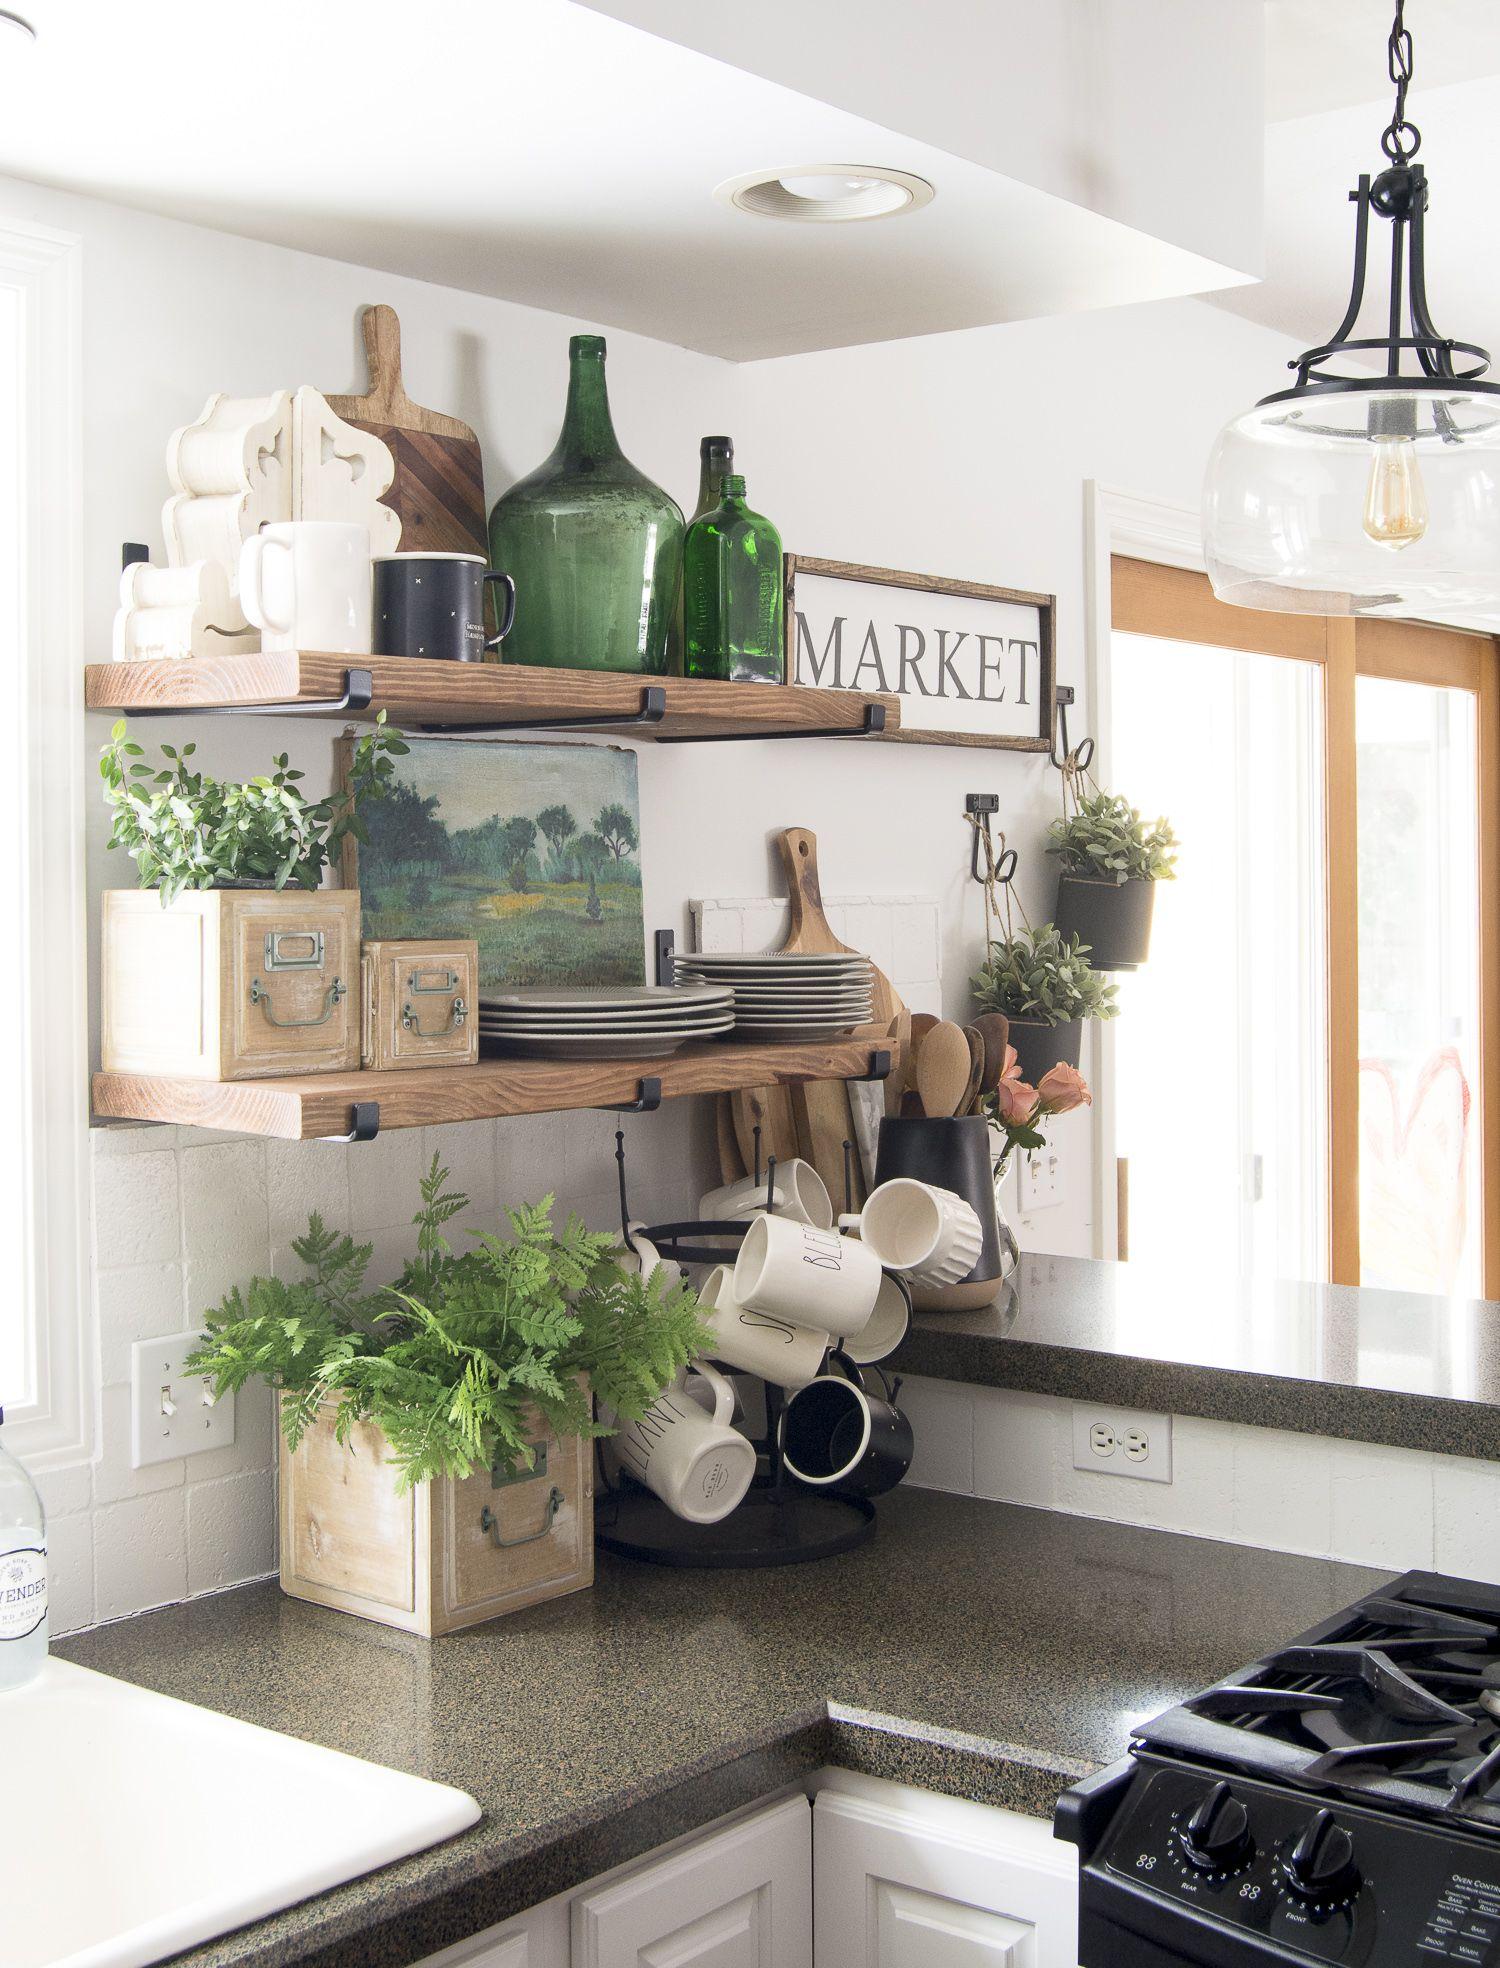 How to Decorate Kitchen Shelves  Kitchen shelf decor, Open